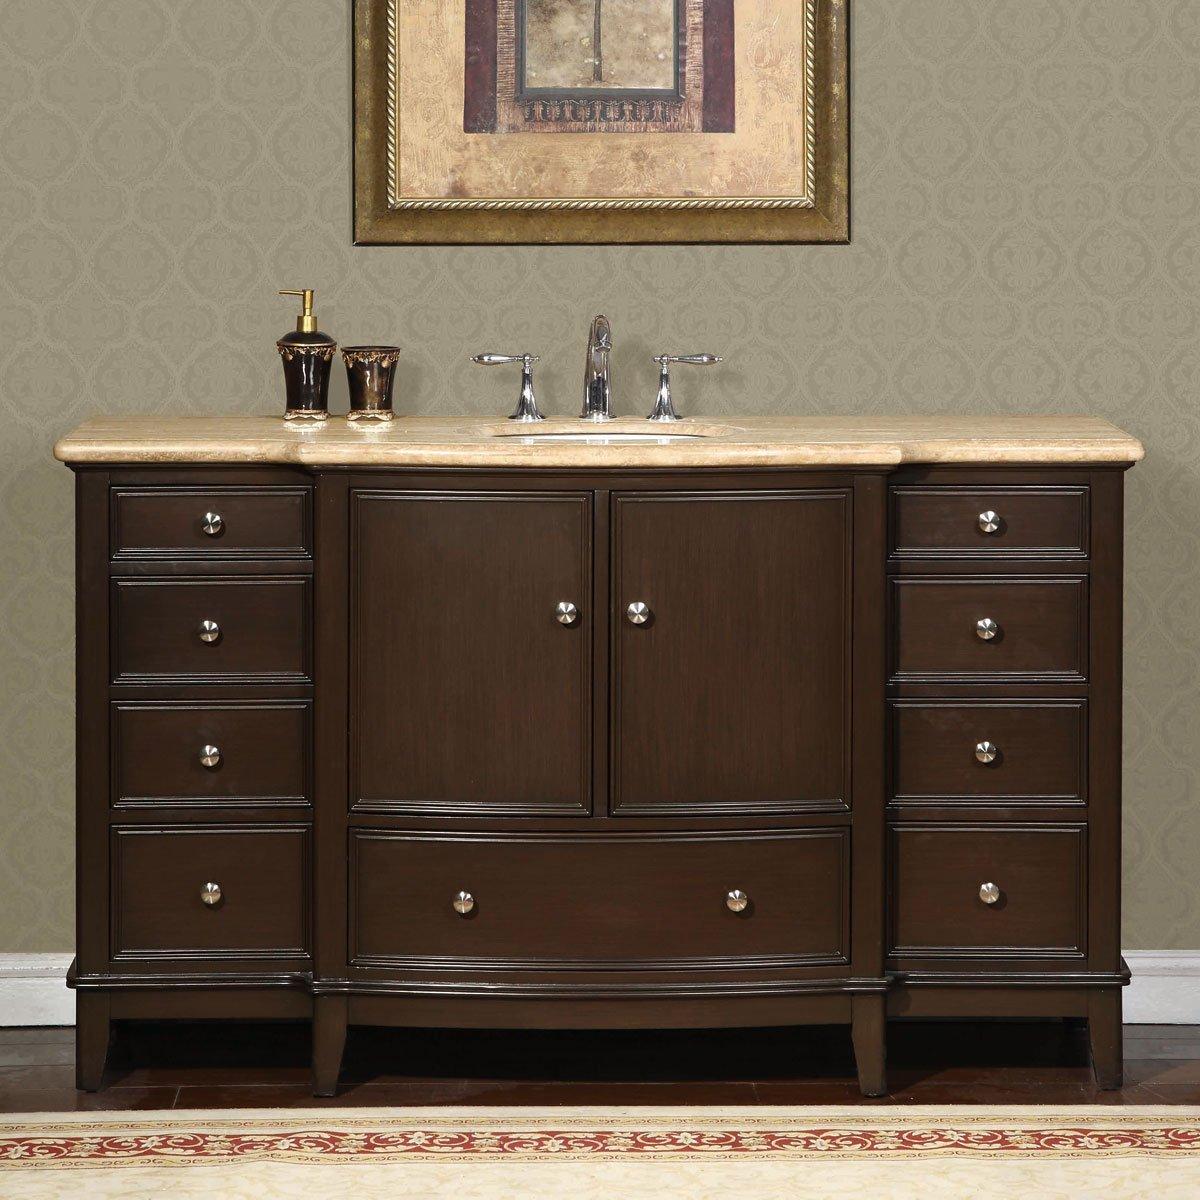 Inch travertine top single sink bathroom vanity lavatory bath cabinet - Amazon Com Silkroad Exclusive Gorgeous Bathroom Travertine Top Single Sink Vanity Lavatory Cabinet 60 Inch Home Kitchen